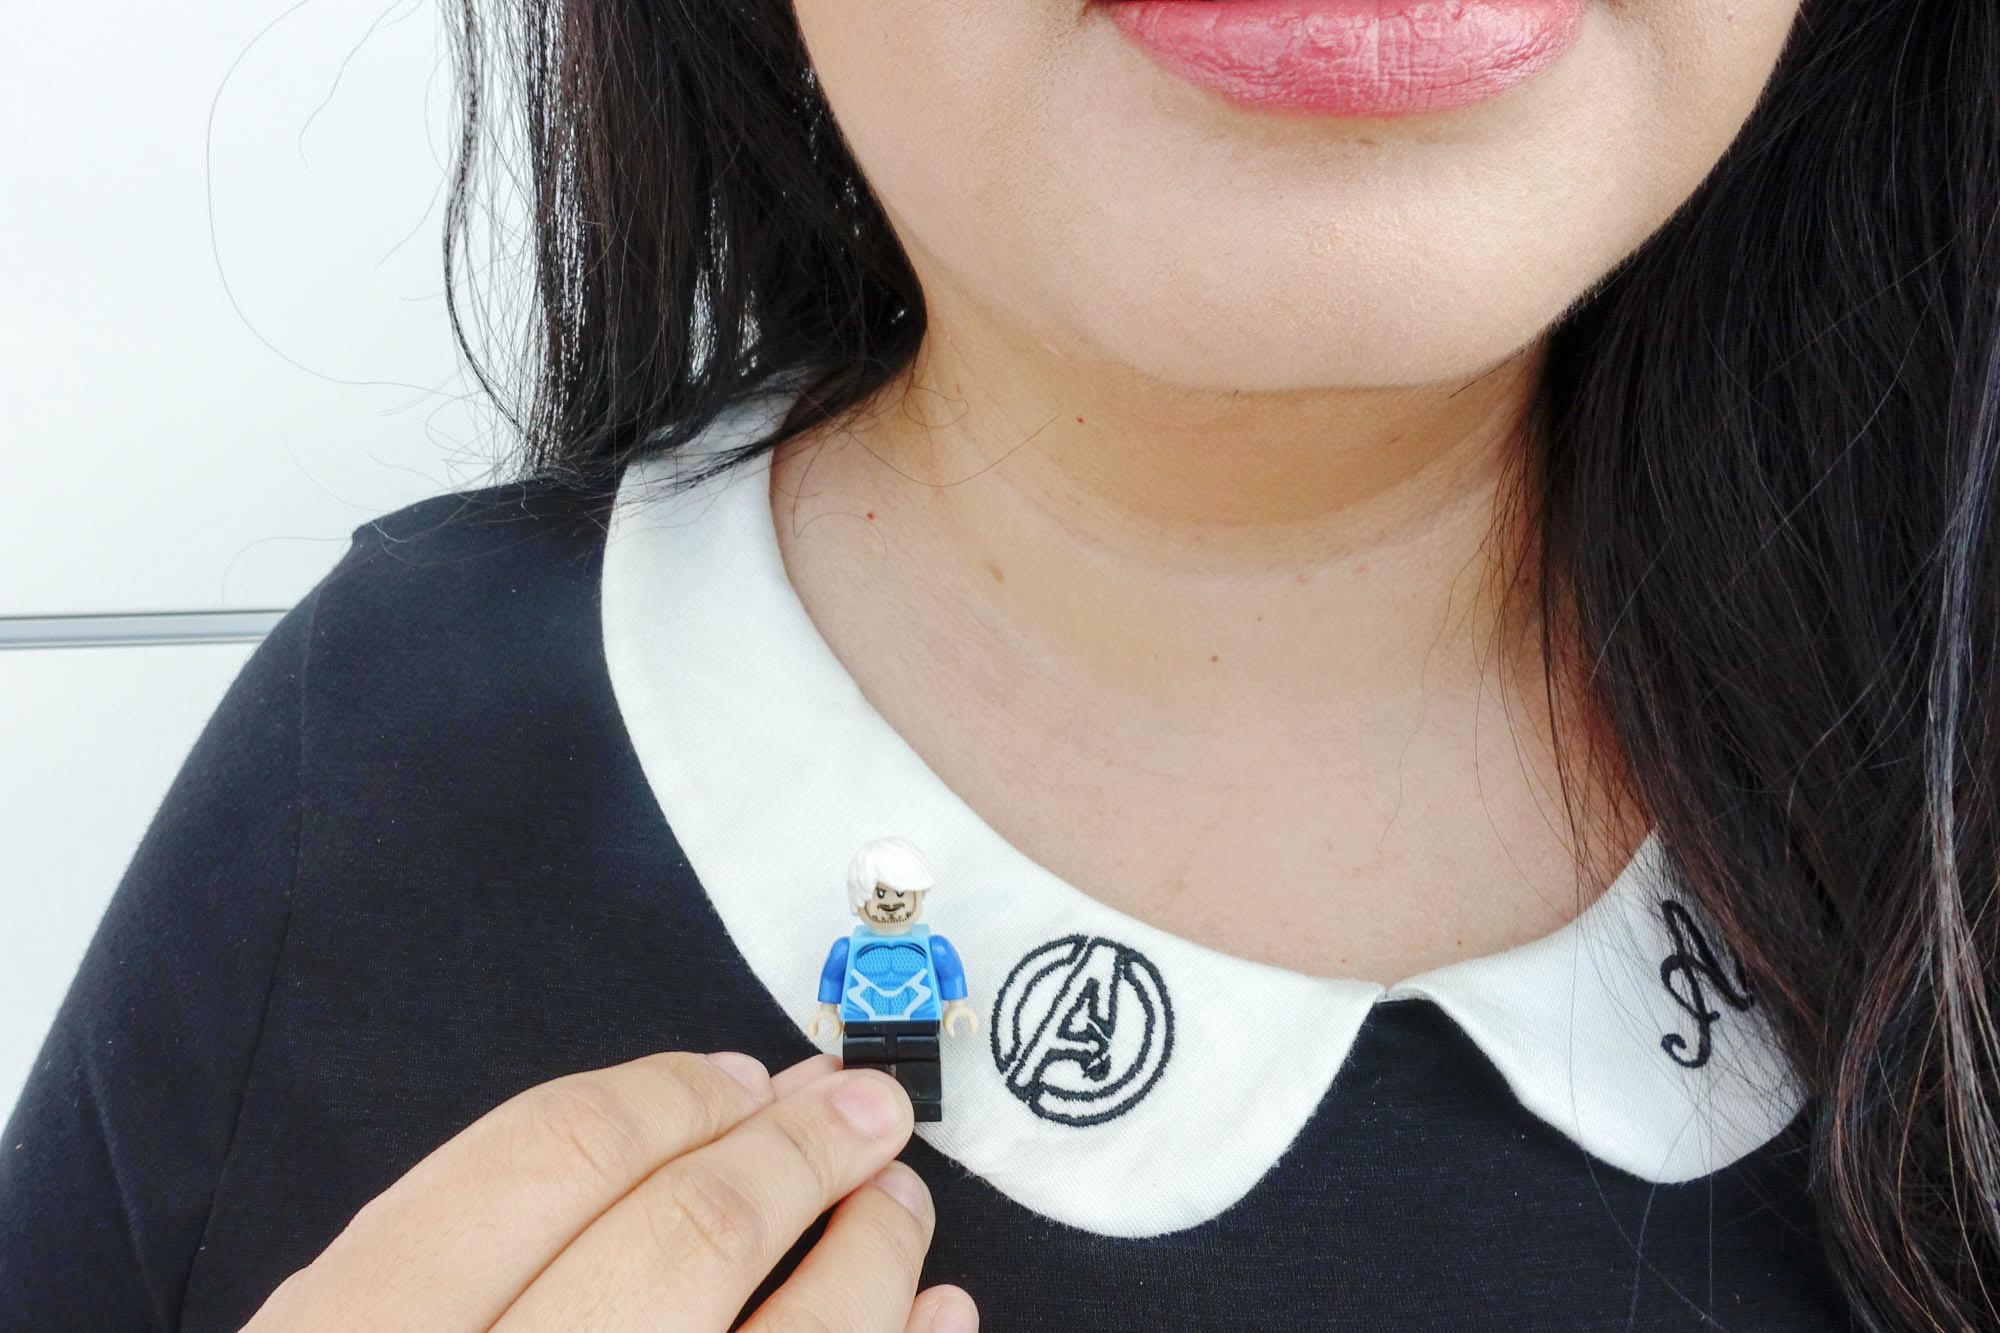 Bonus photo- with a Lego sized Pietro Maximoff (aka Quicksilver aka my fictional boyfriend)